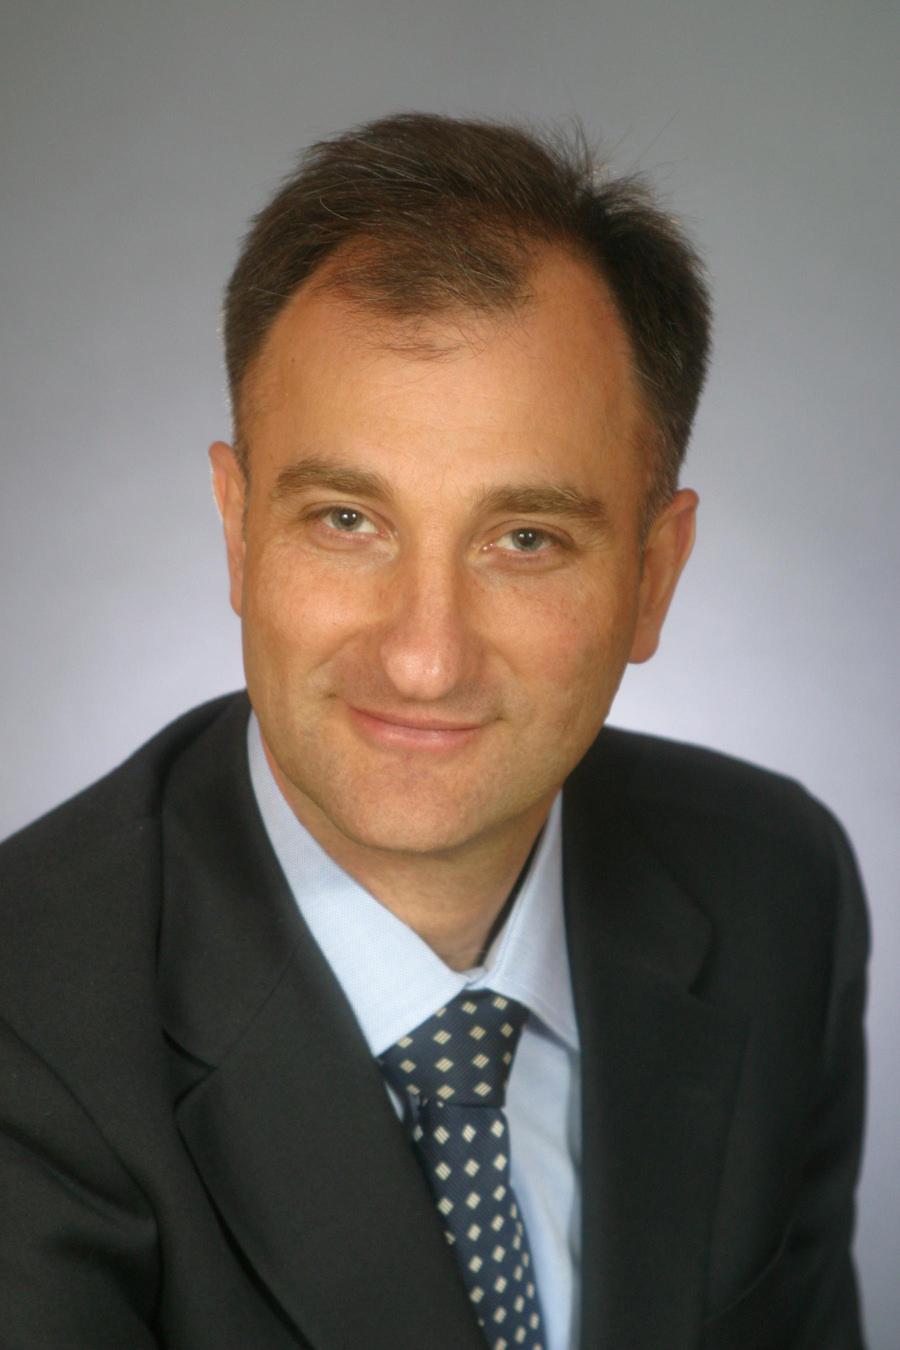 Marco Stilli